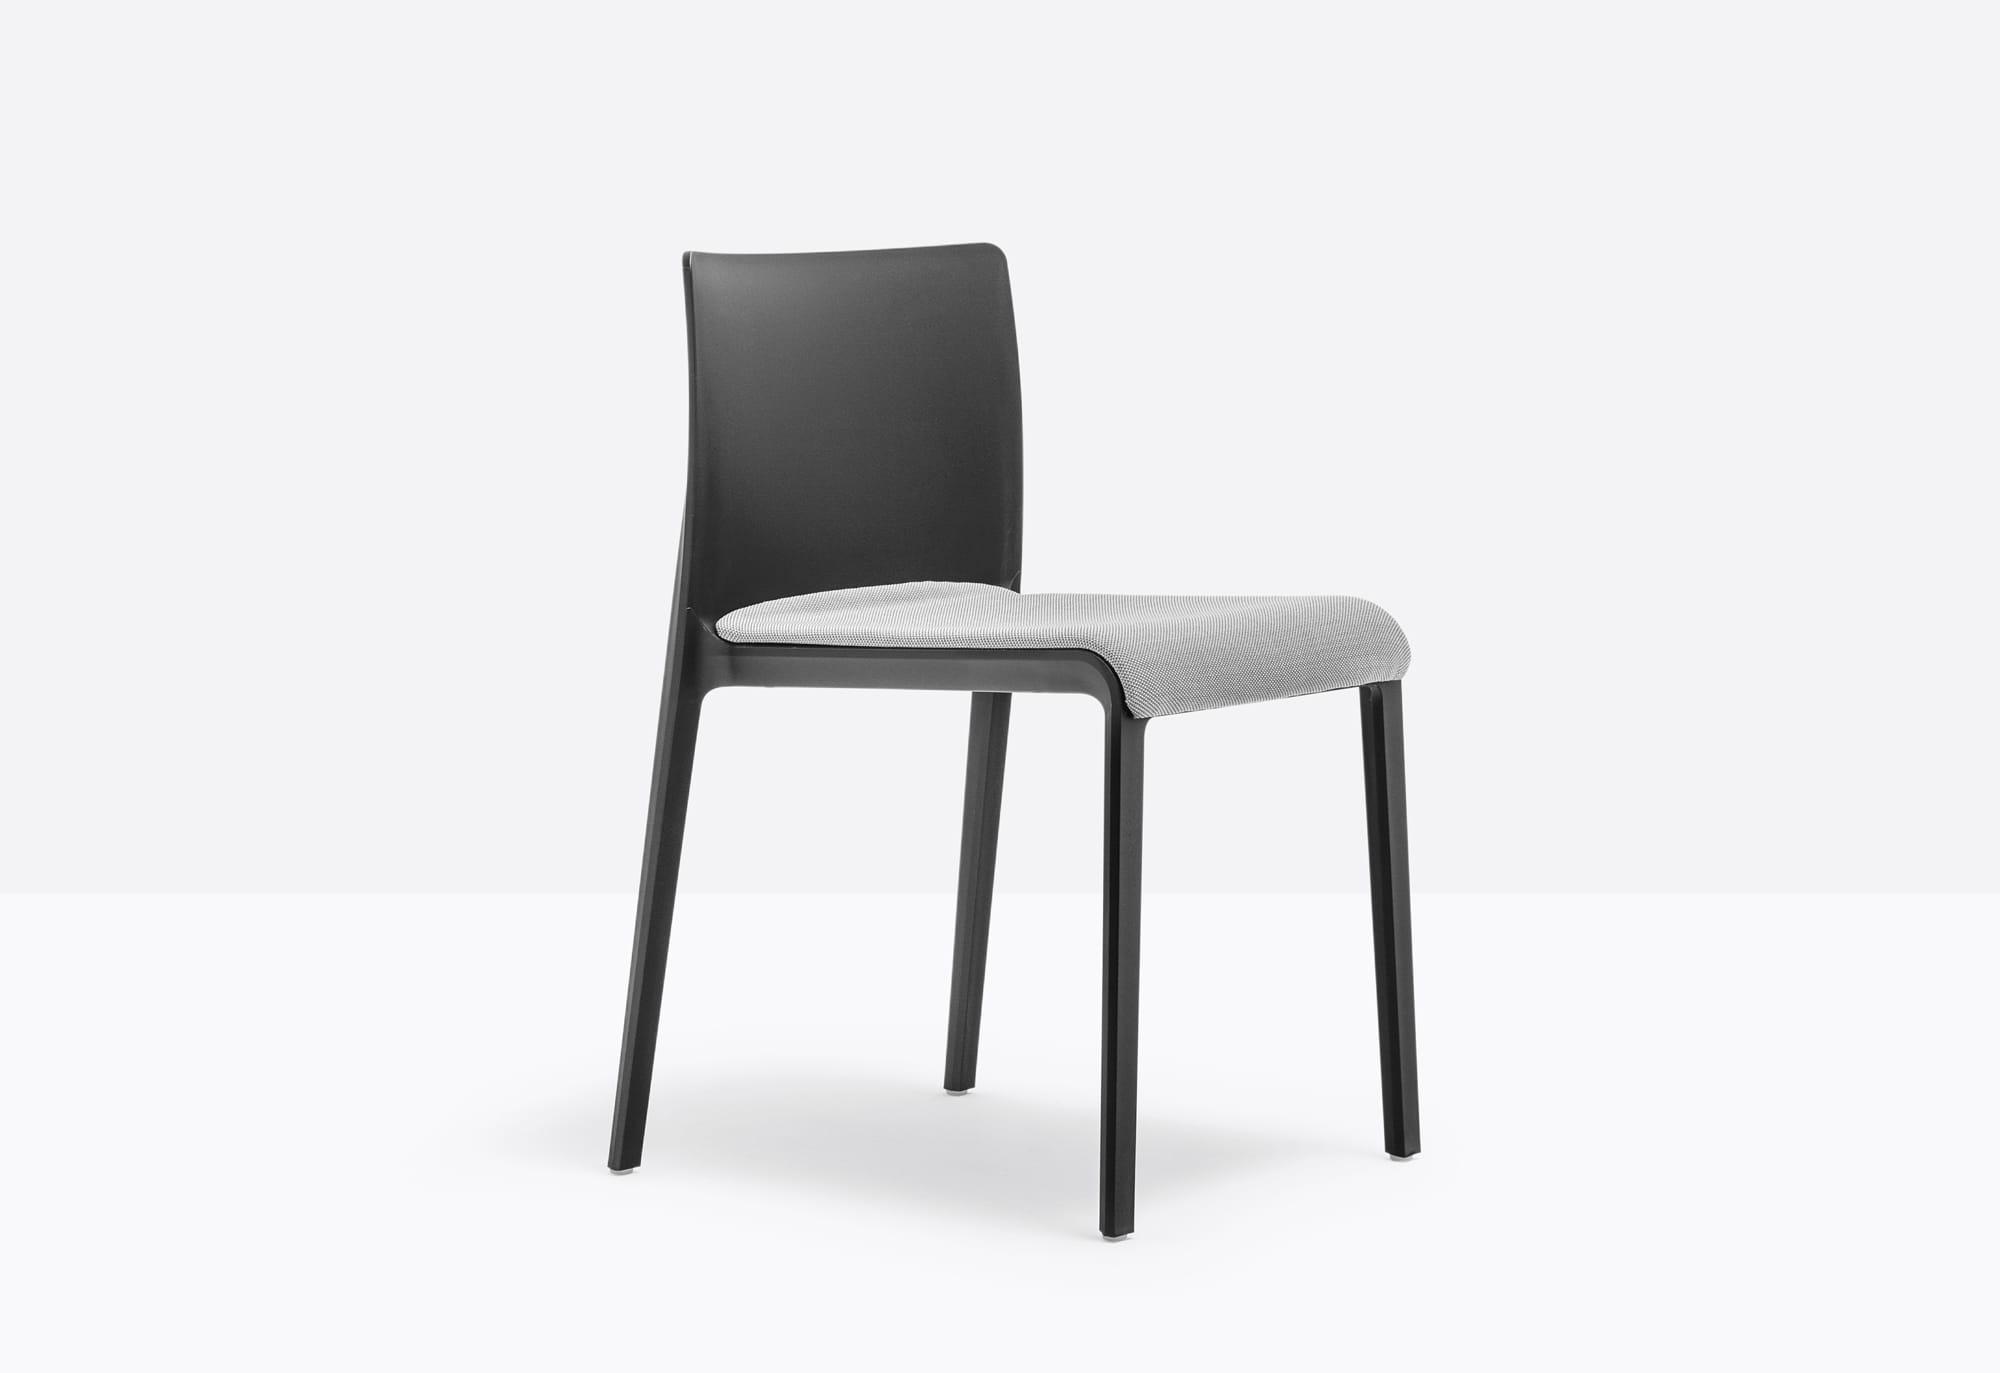 Pedrali Krzesło Volt 671/2 Niebieski